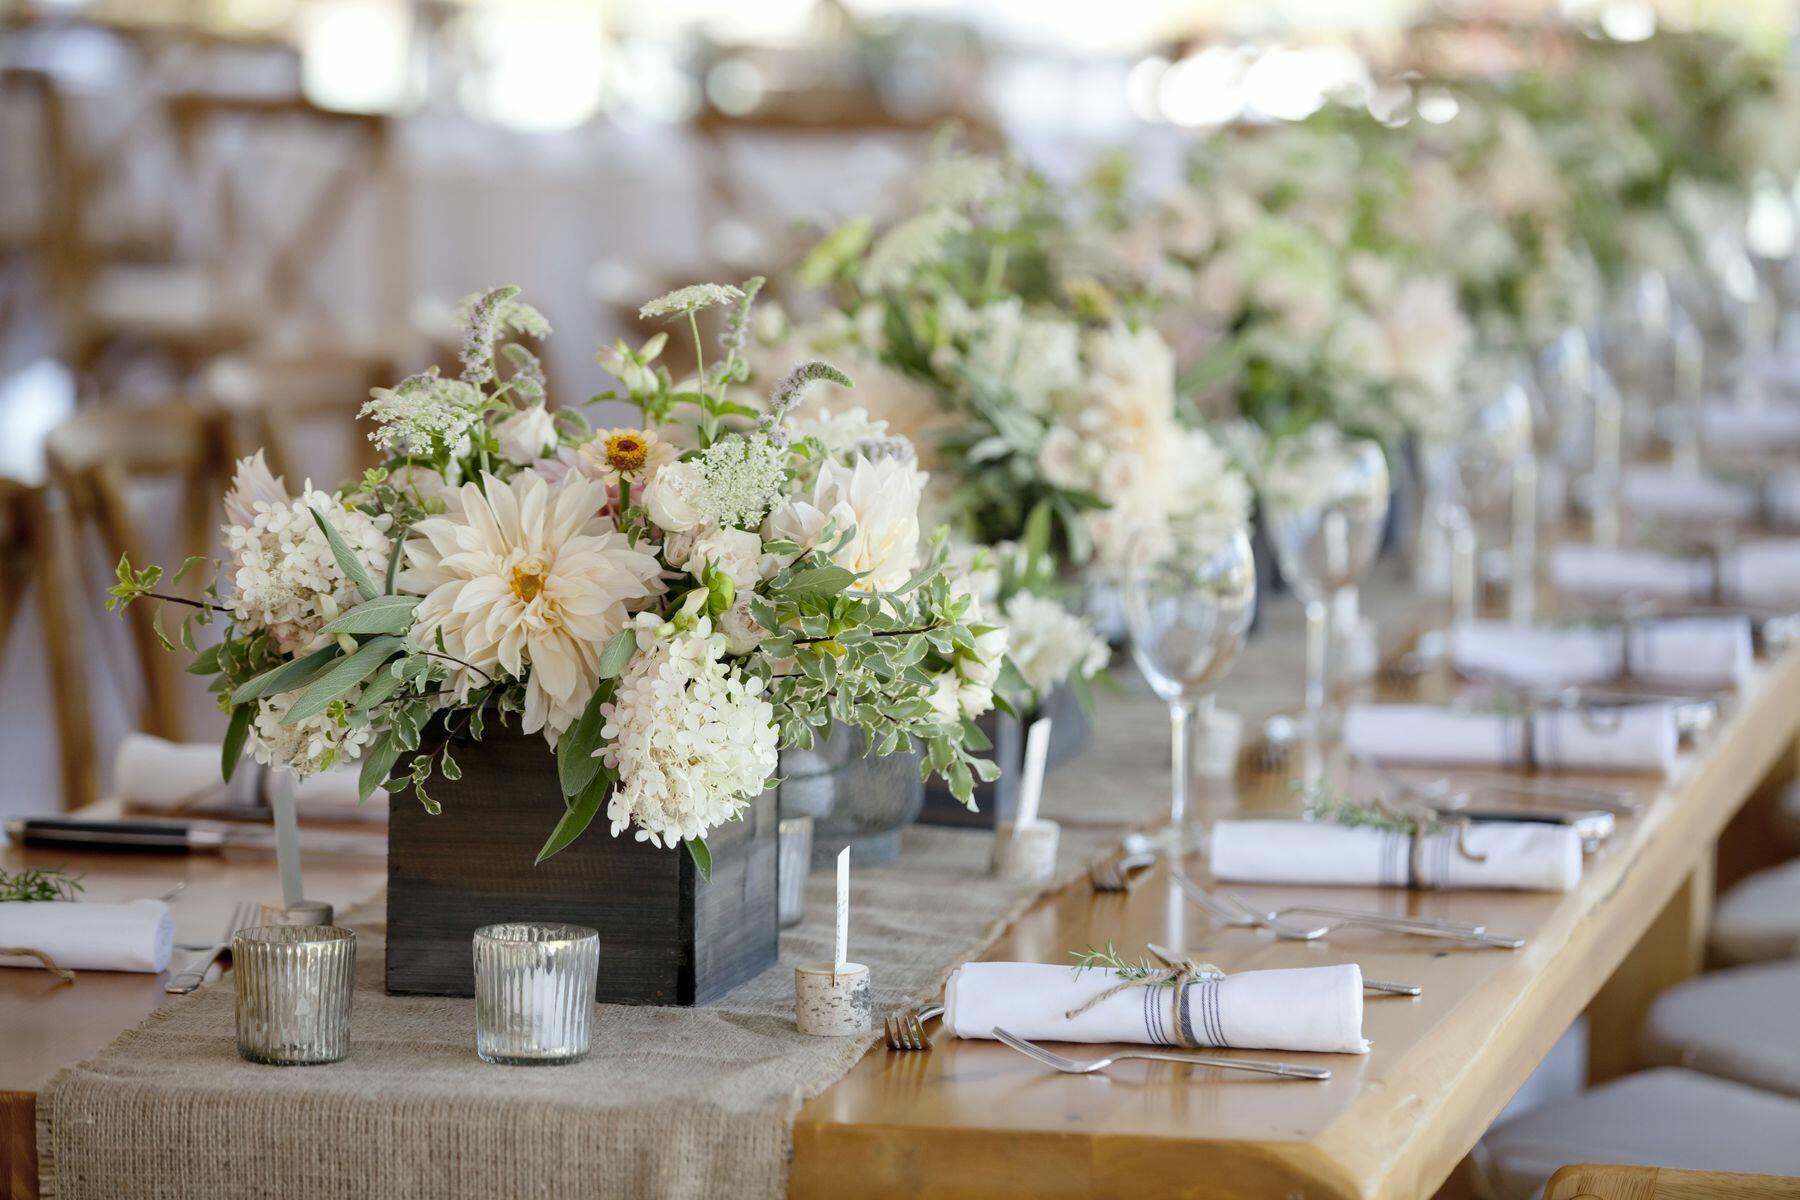 Banquet tables set for wedding reception.